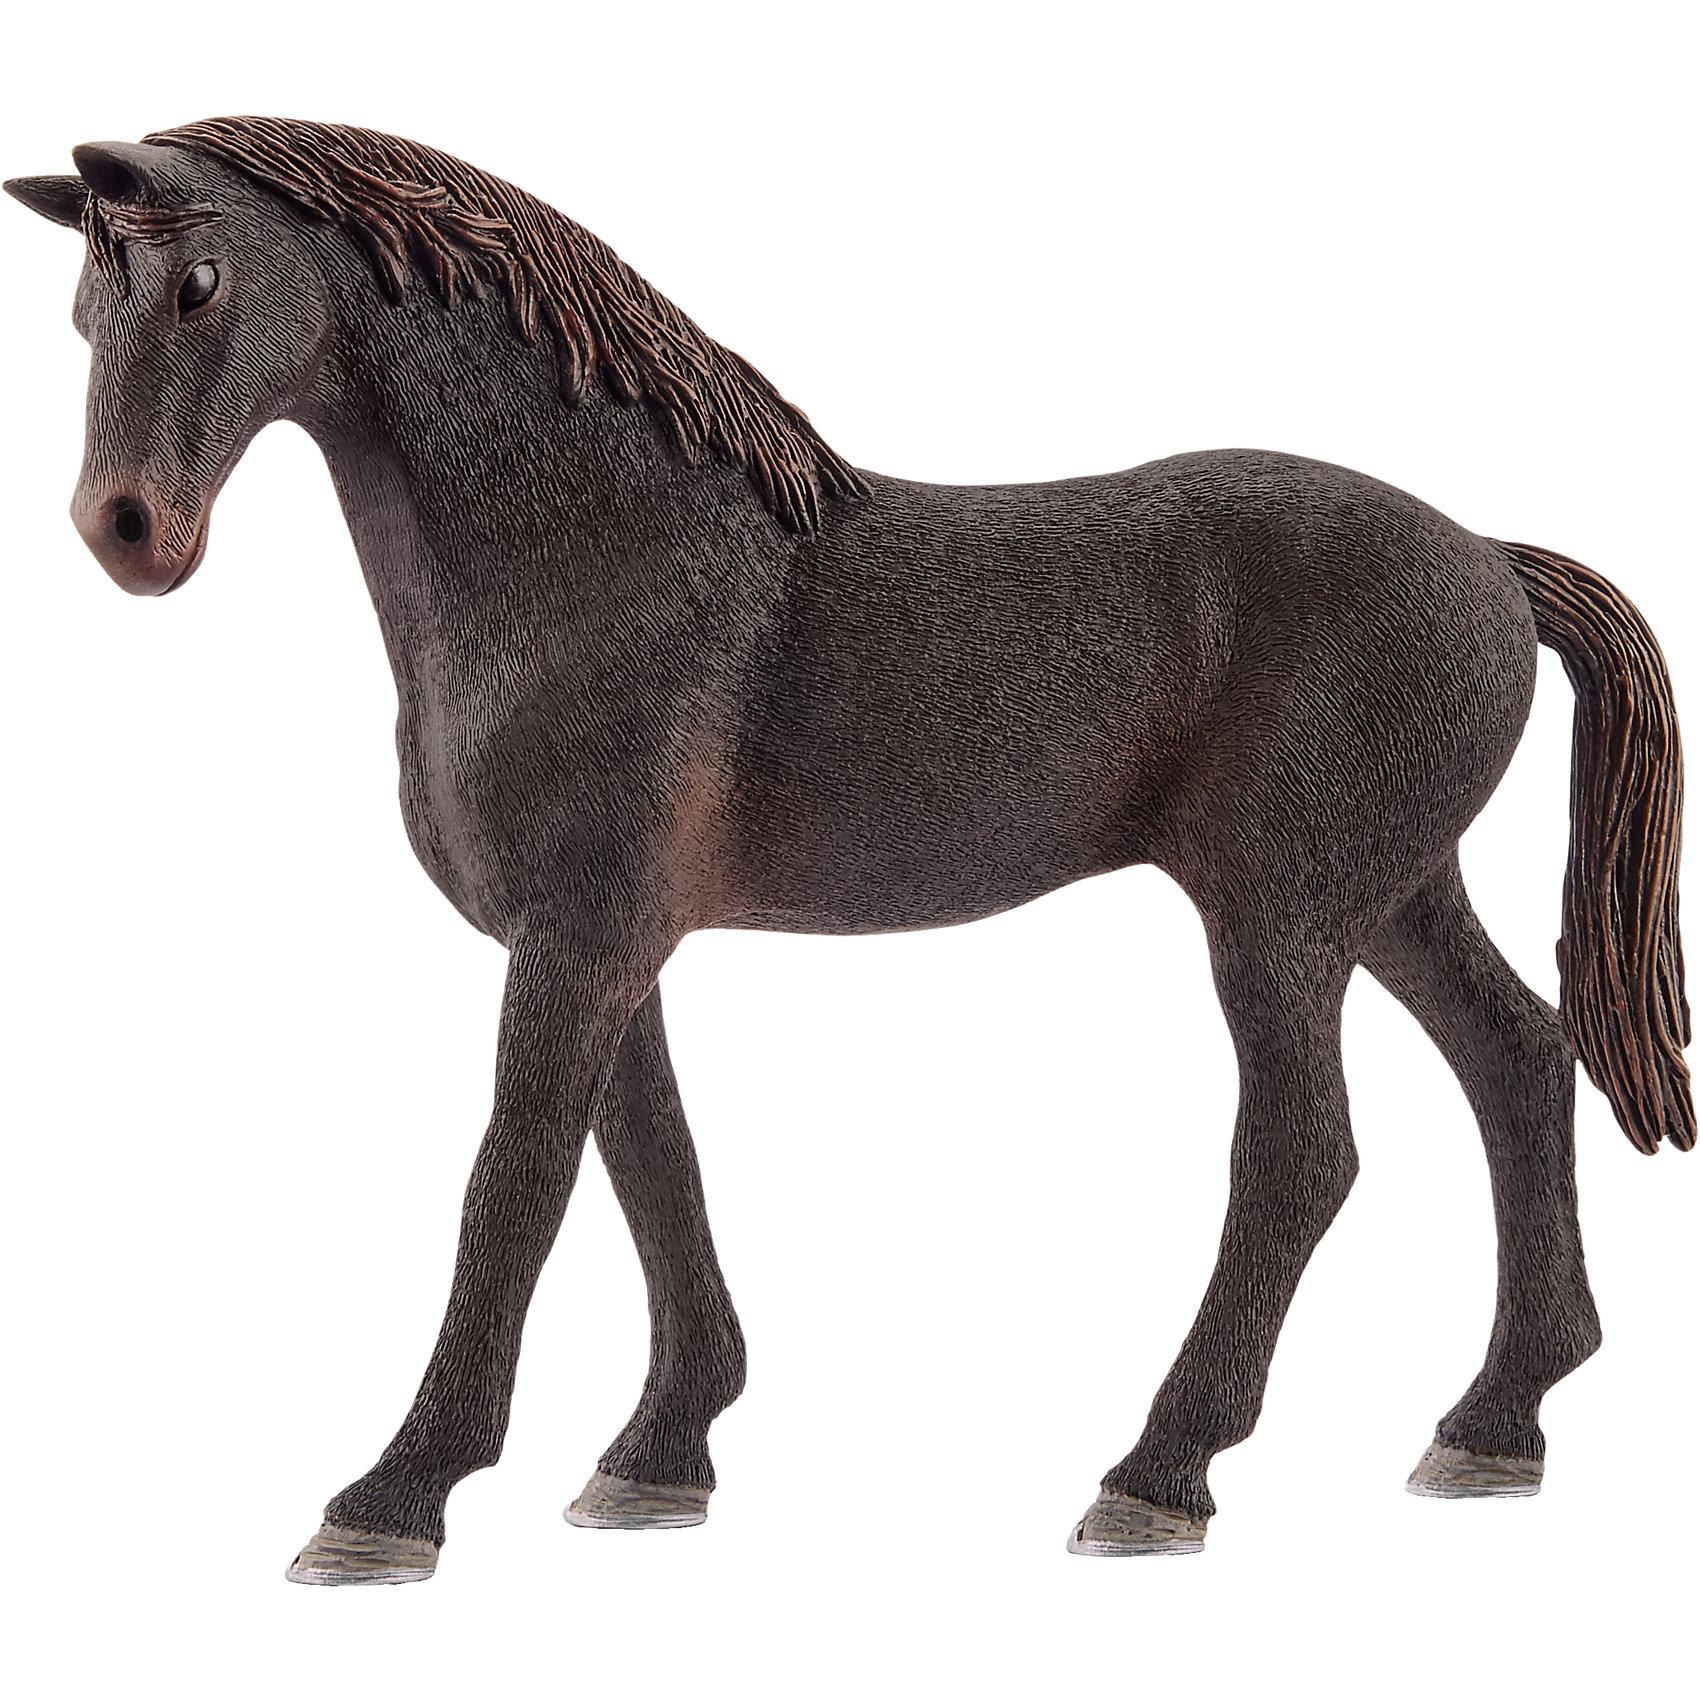 все картинки фигурок лошадей нужен совет